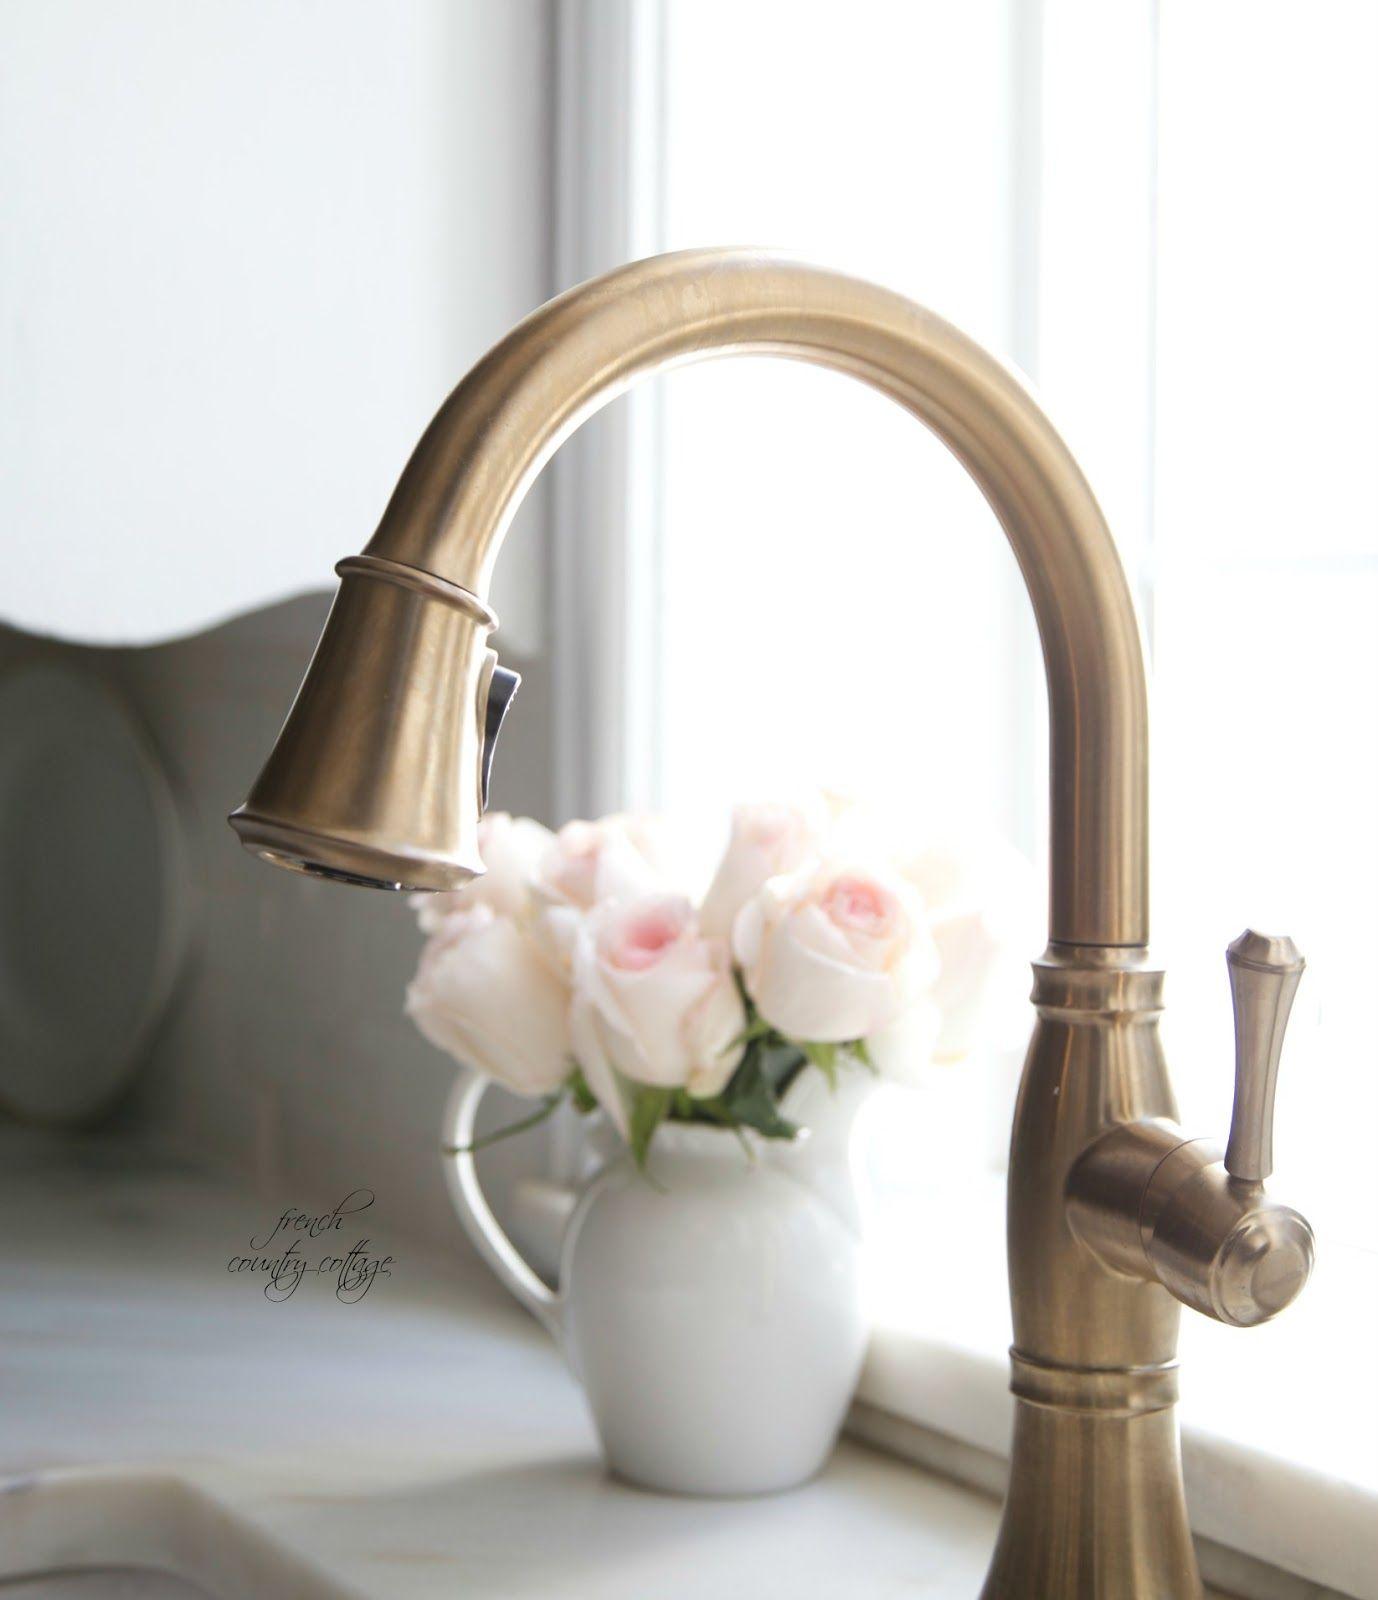 Jessica maxey plumbingsupplyco on pinterest